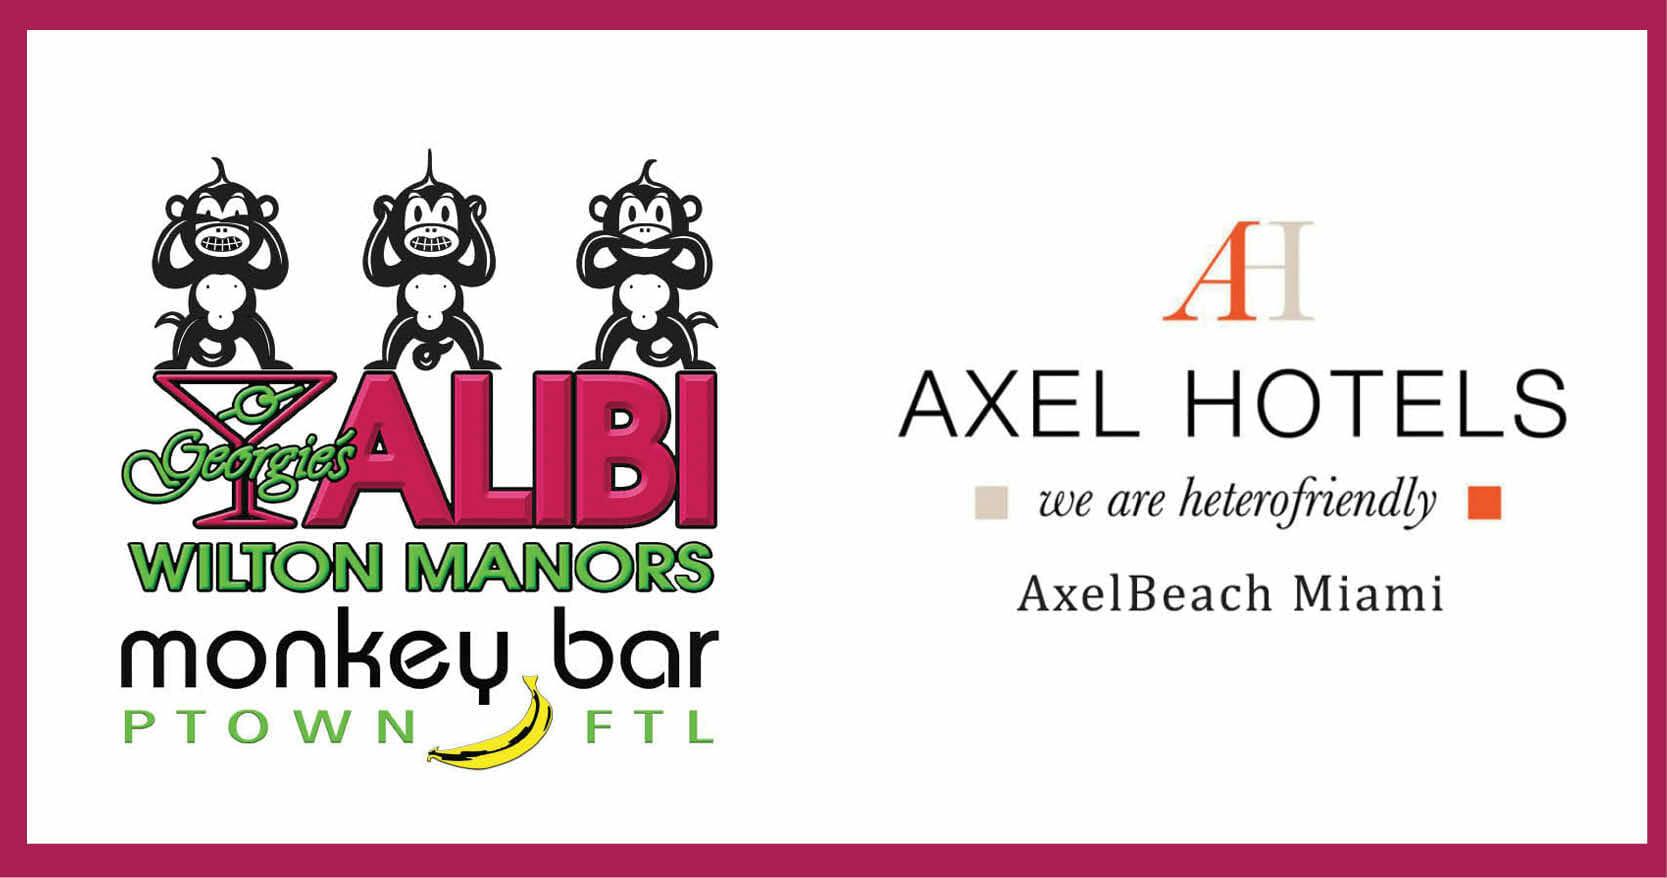 Georgie's Alibi Monkey Bar + AxelBeach Miami Hotel = Alibi at AxelBeach